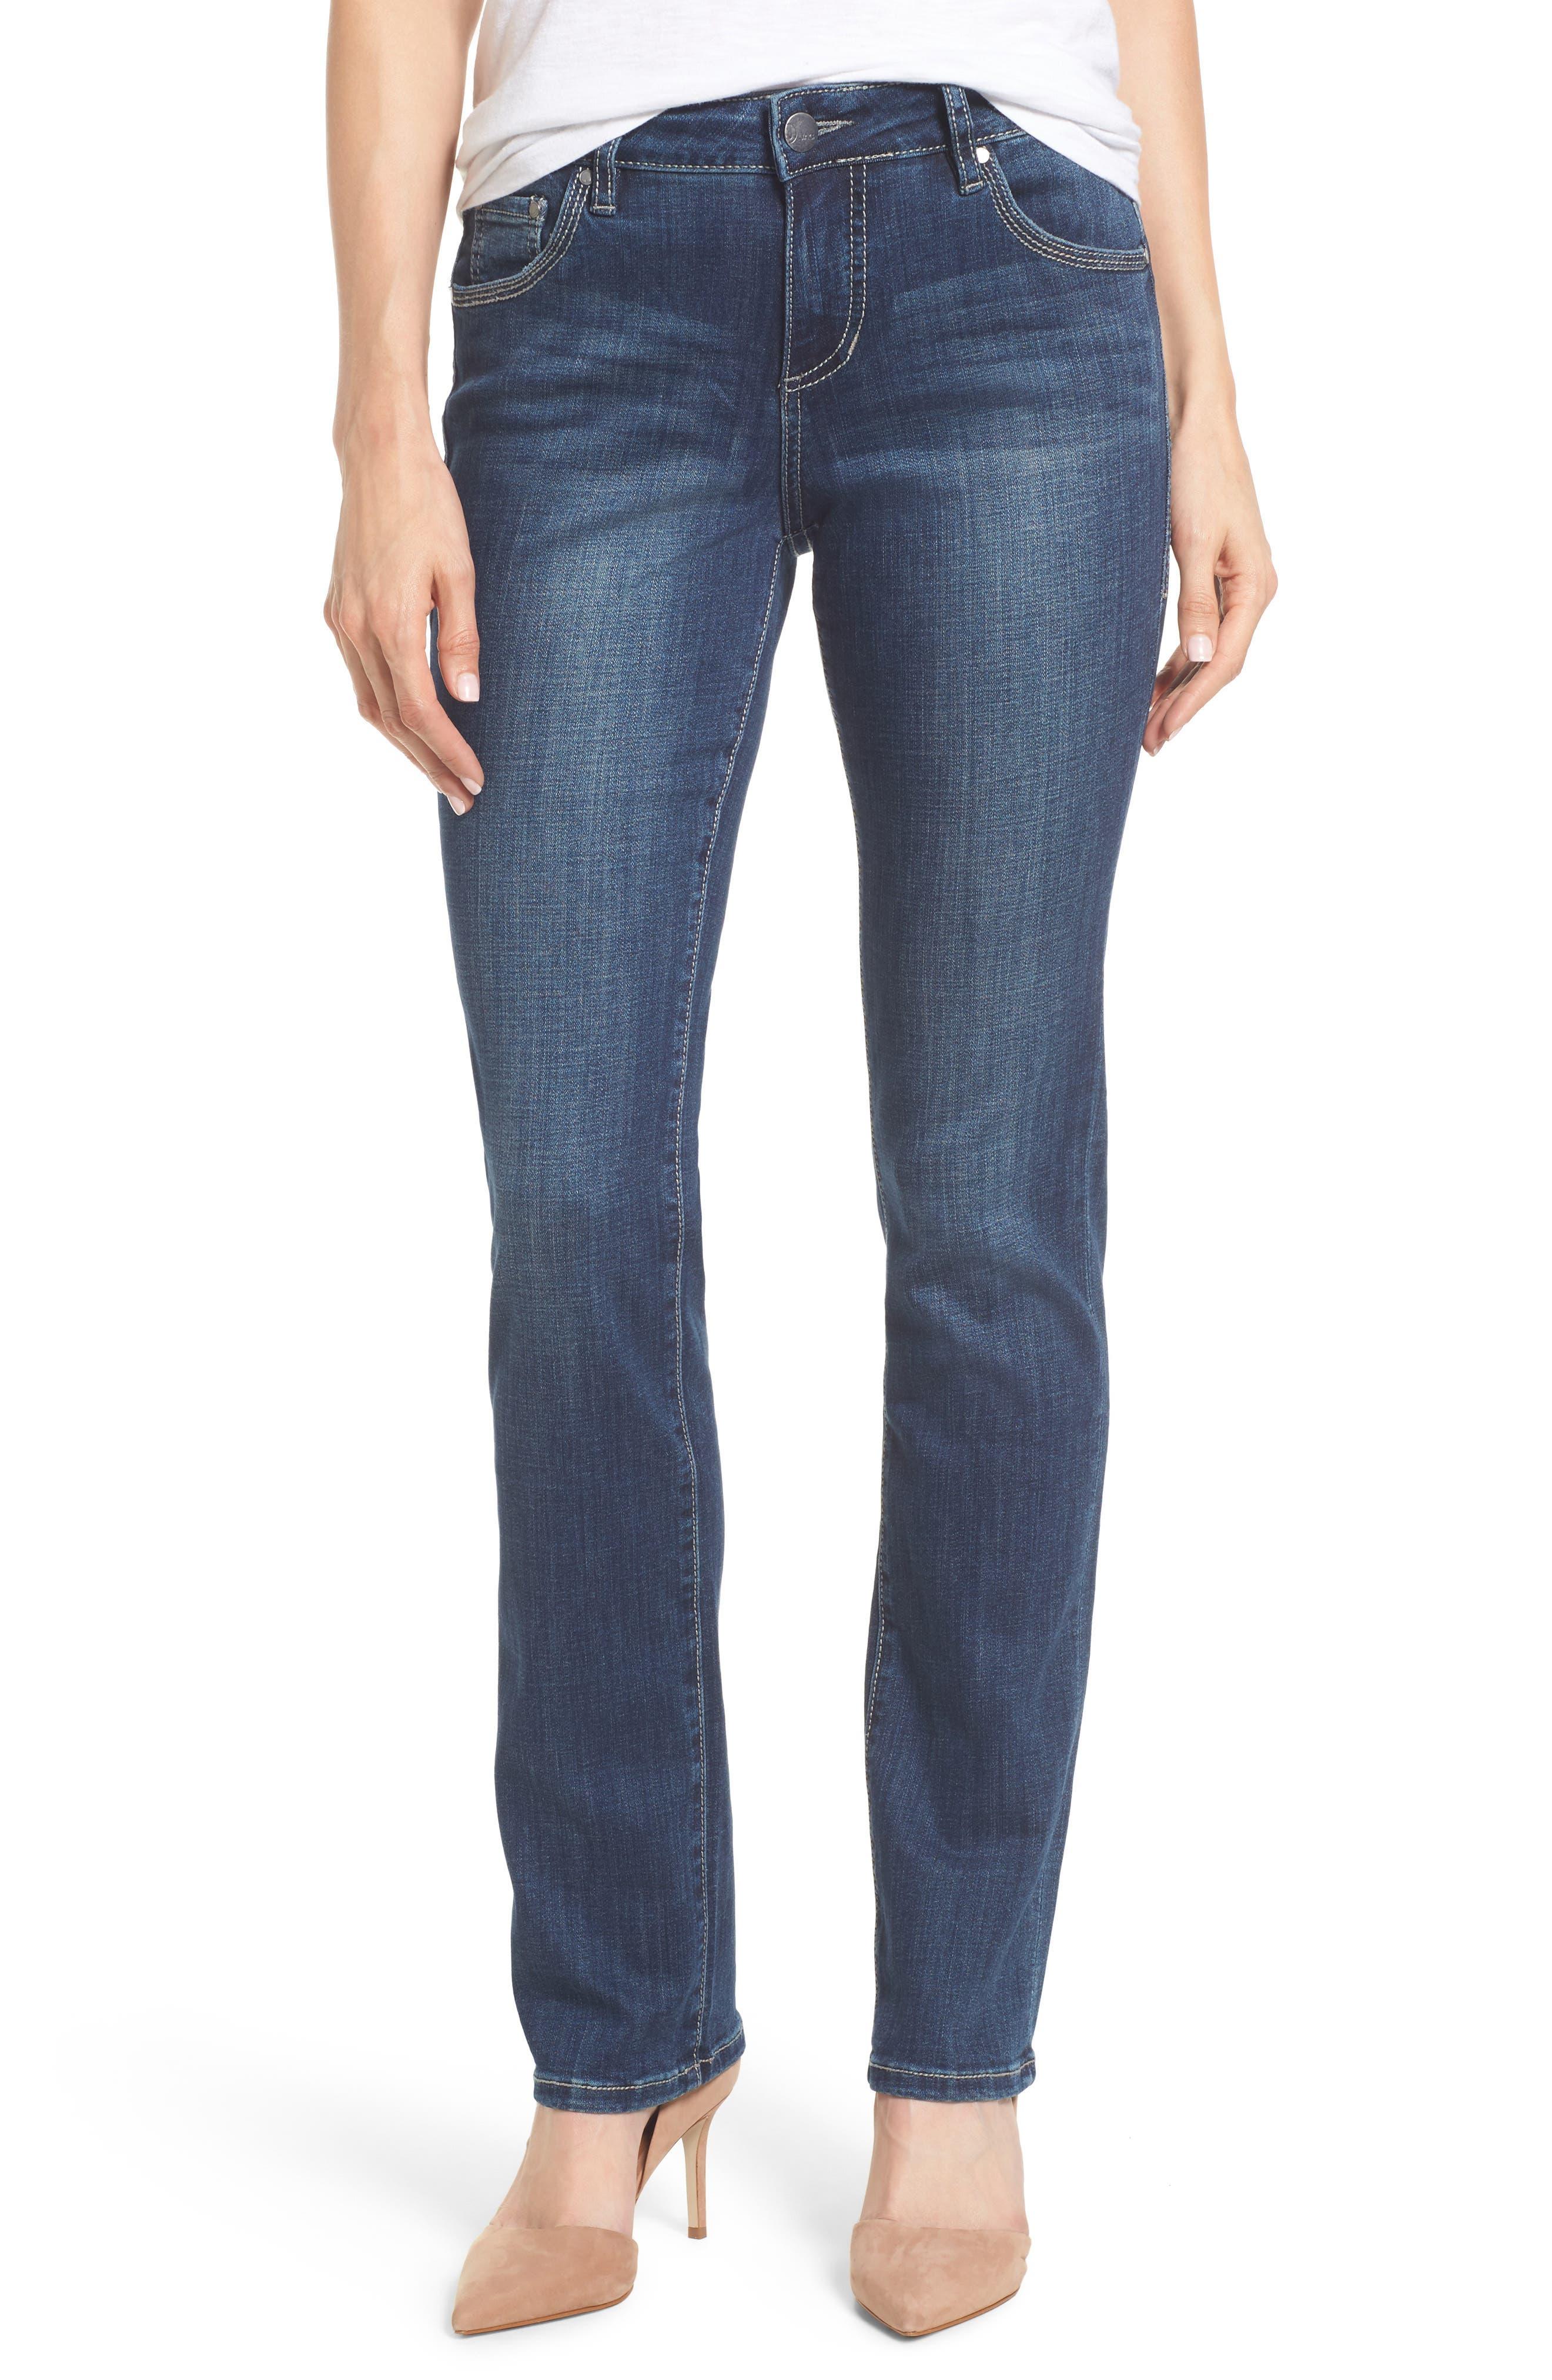 Adrian Straight Leg Jeans,                             Main thumbnail 1, color,                             Thorne Blue